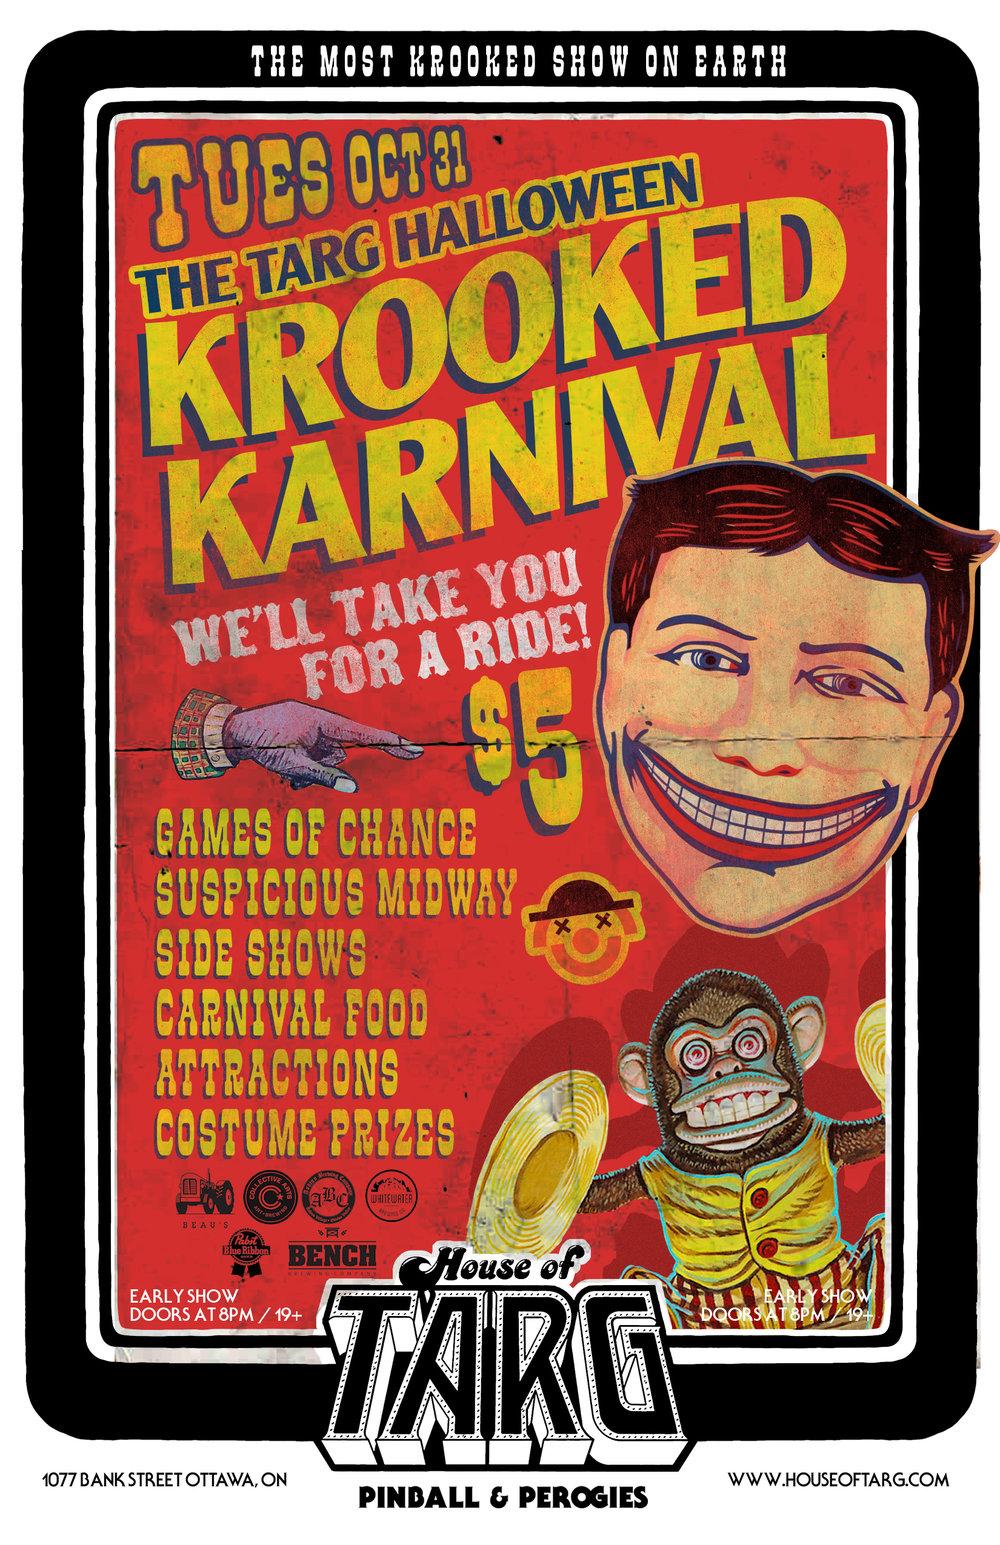 Krooked Karnival.jpg